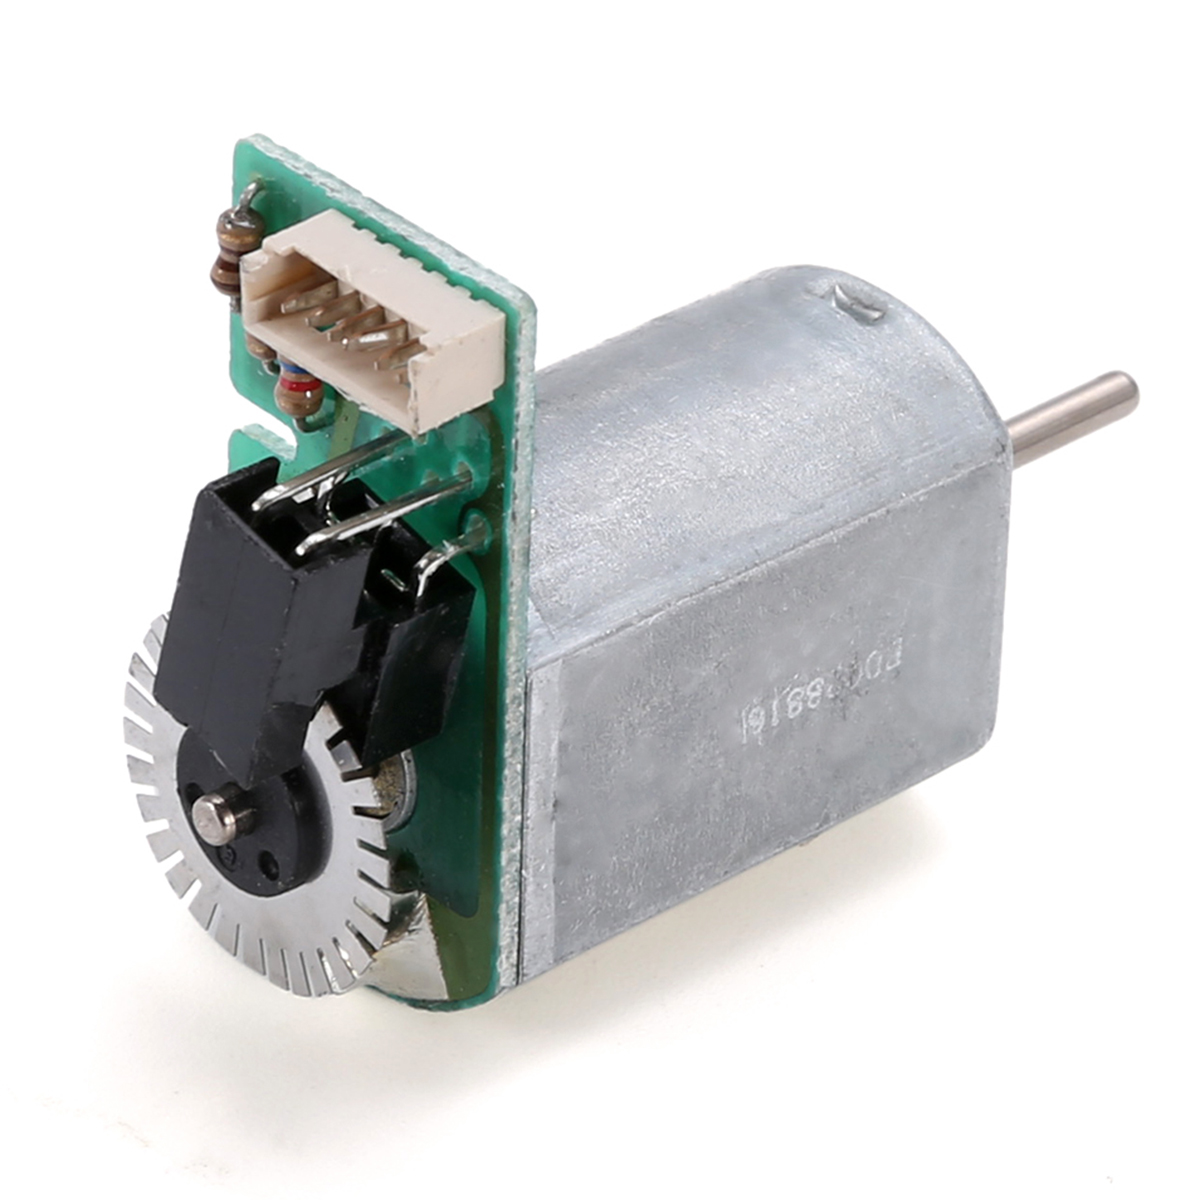 Mayitr DC 6V-12V 130 Motor 7800RPM Mini Motor with Metal Speed Encoder Tachometer Motor AB Phase Long service life